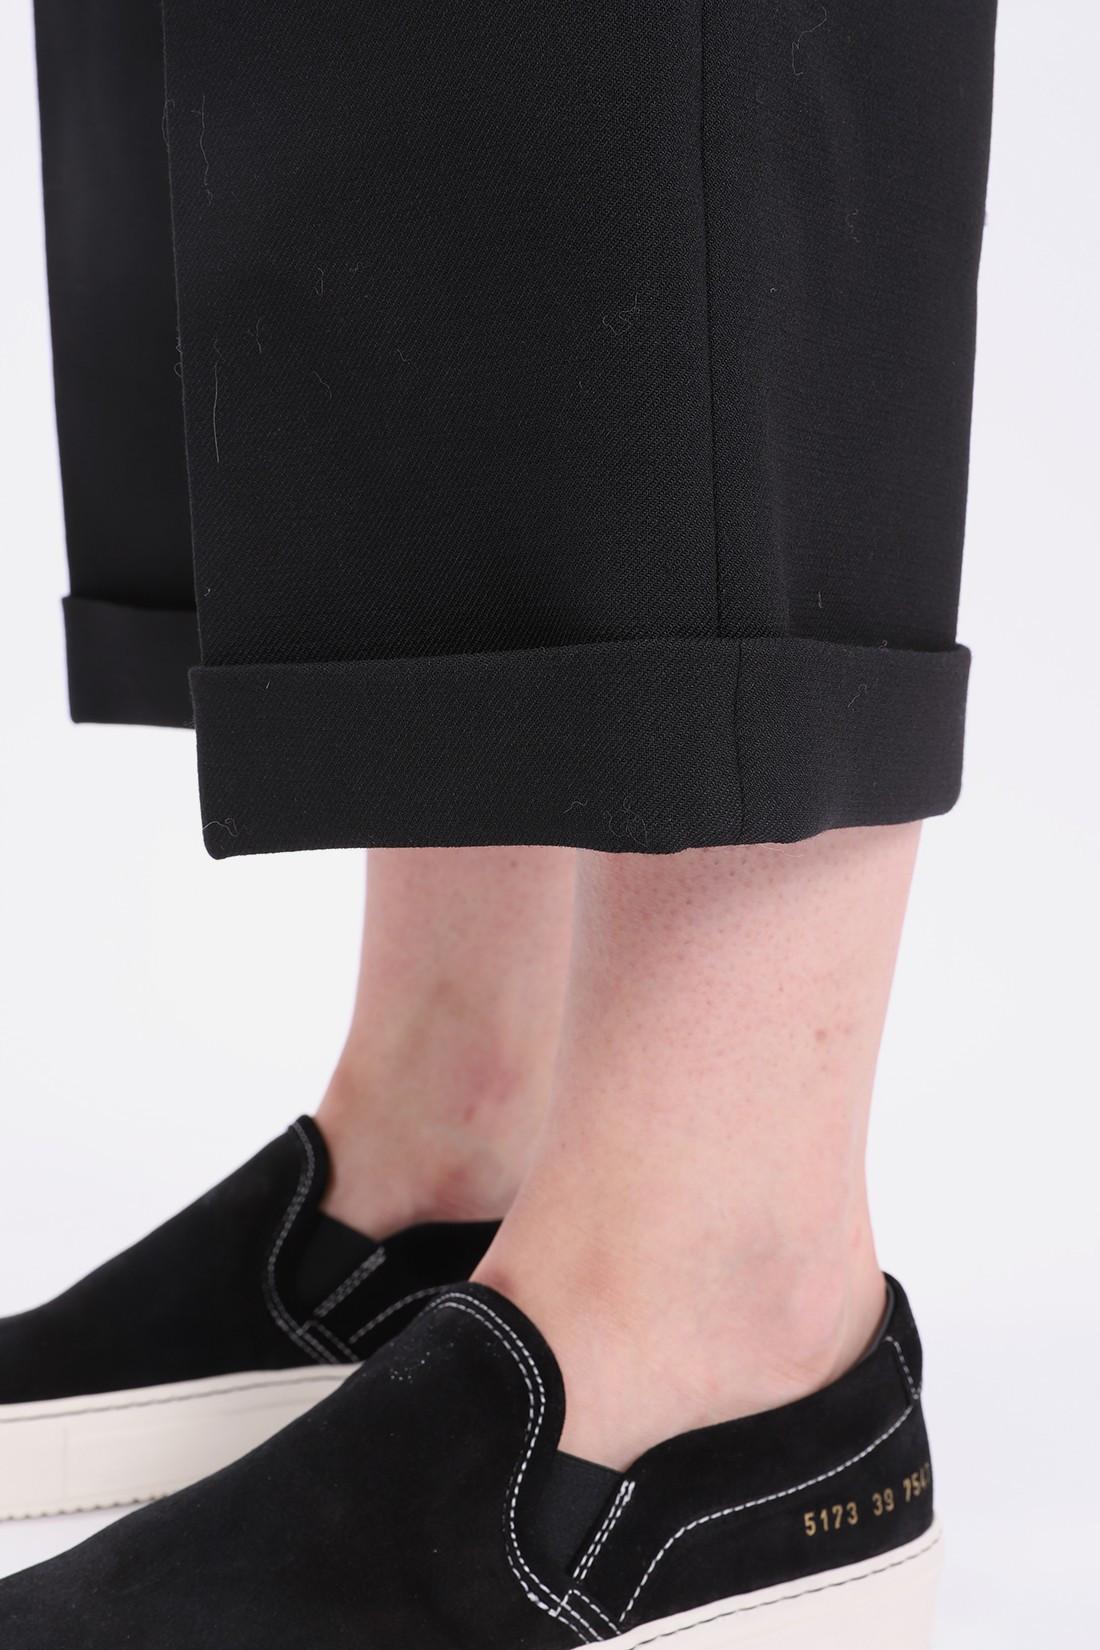 MM6 MAISON MARGIELA FOR WOMAN / S32ka0542 wide leg trouser Black